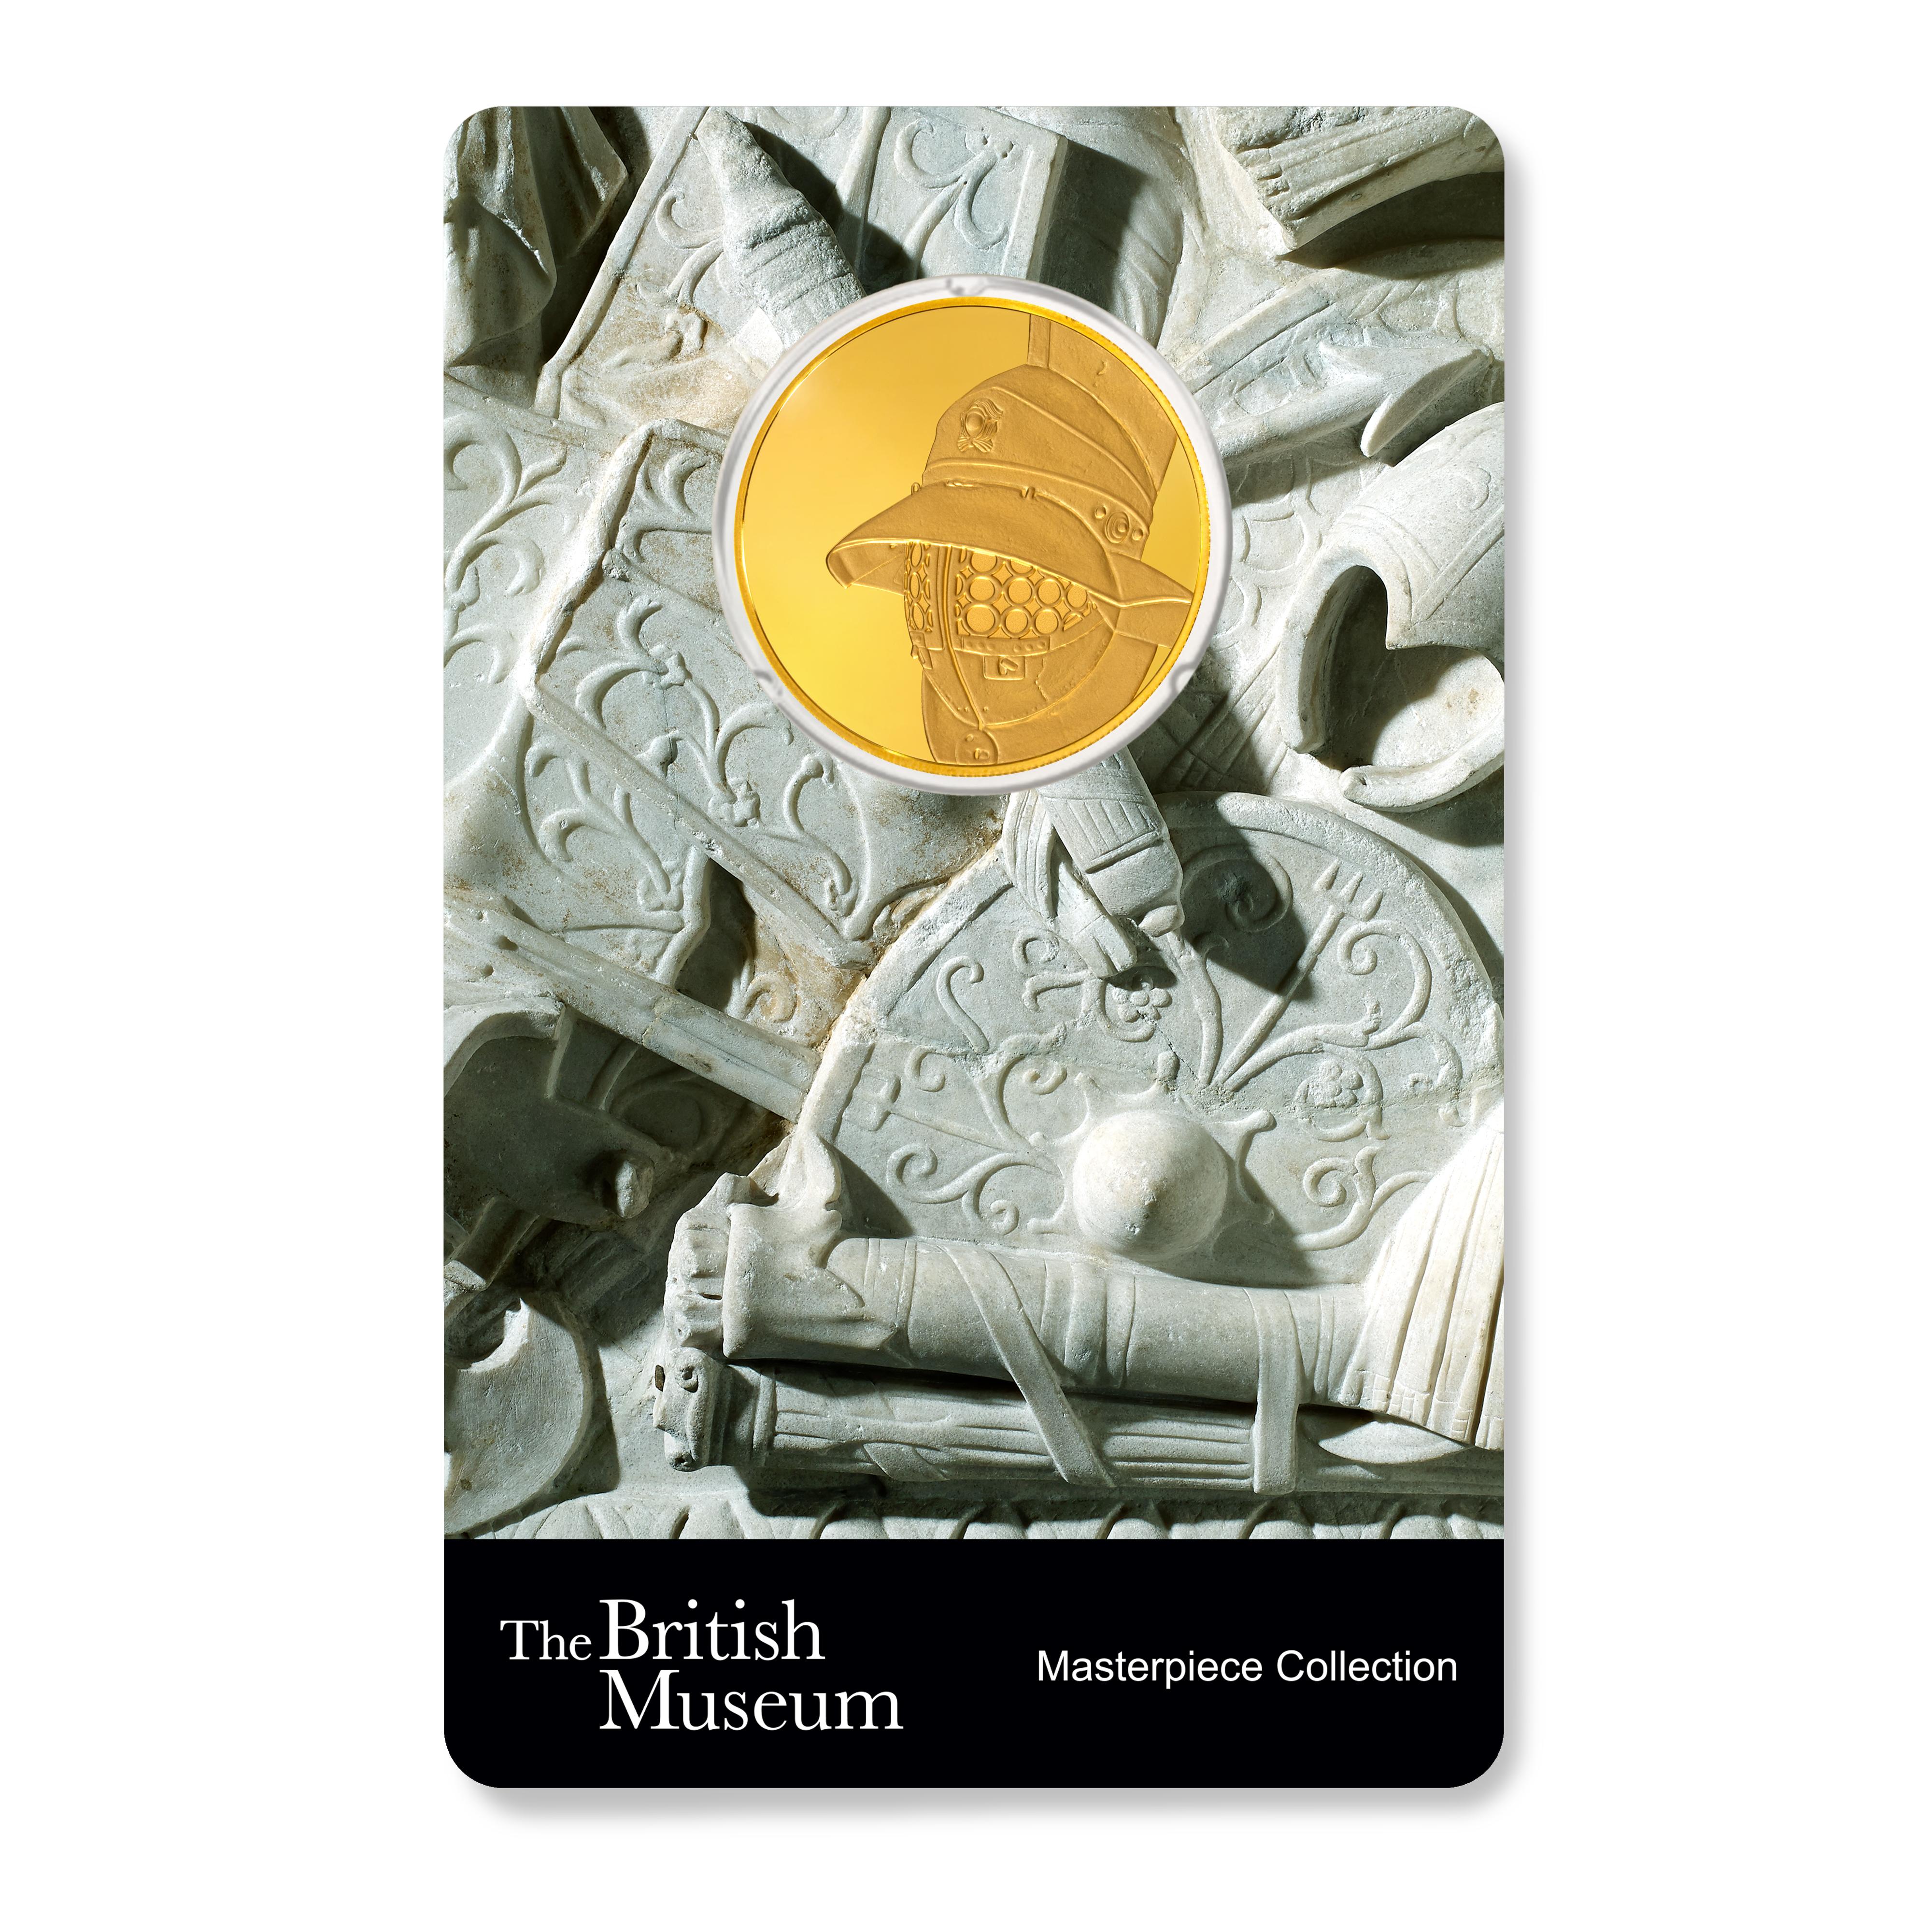 3x1/4 Unzen - 3 Goldmünzen Set PAMP Britisches Museum  Helme 2020 PP (Box, Zertifikat)